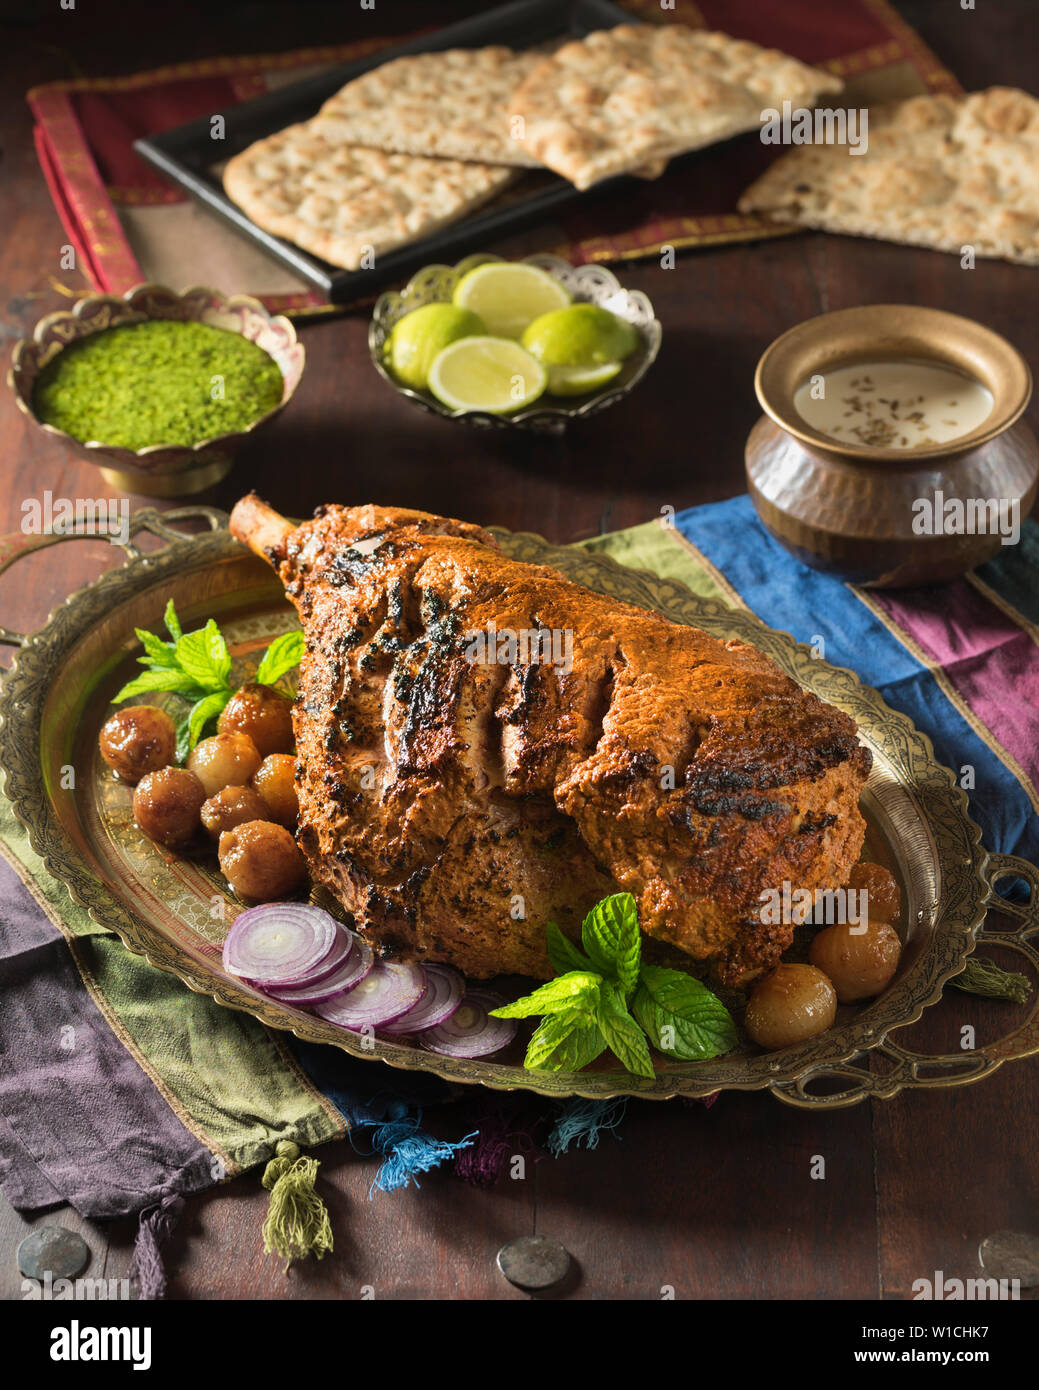 Raan masaledar. Roast spiced leg of lamb. India Food - Stock Image